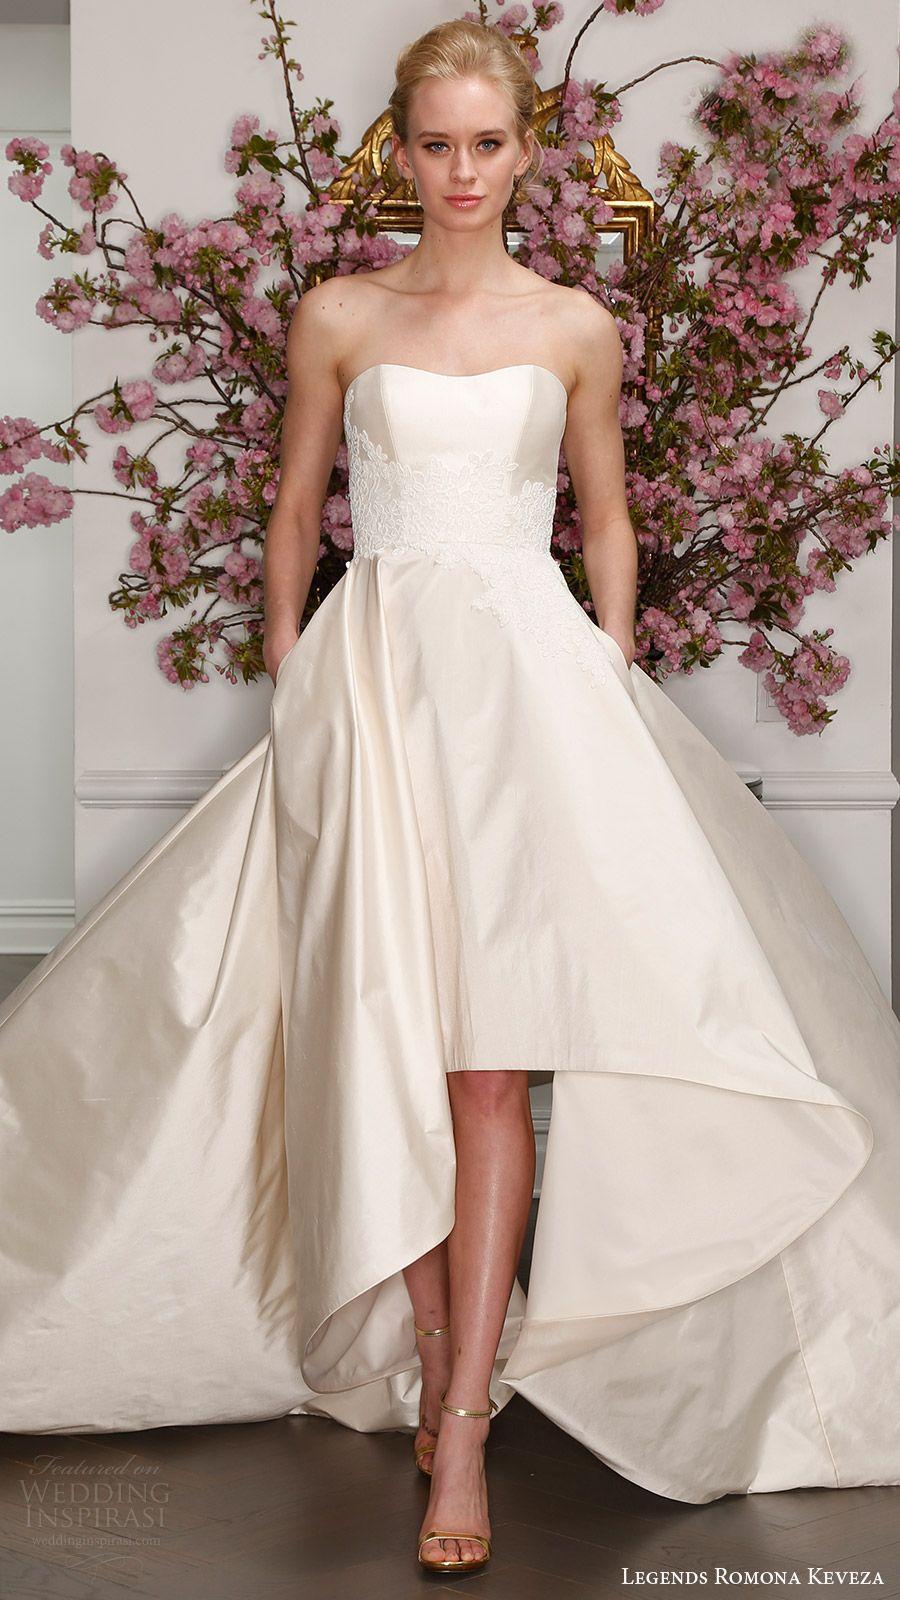 Legends Romona Keveza Spring 2017 Wedding Dresses | wedding ideas ...